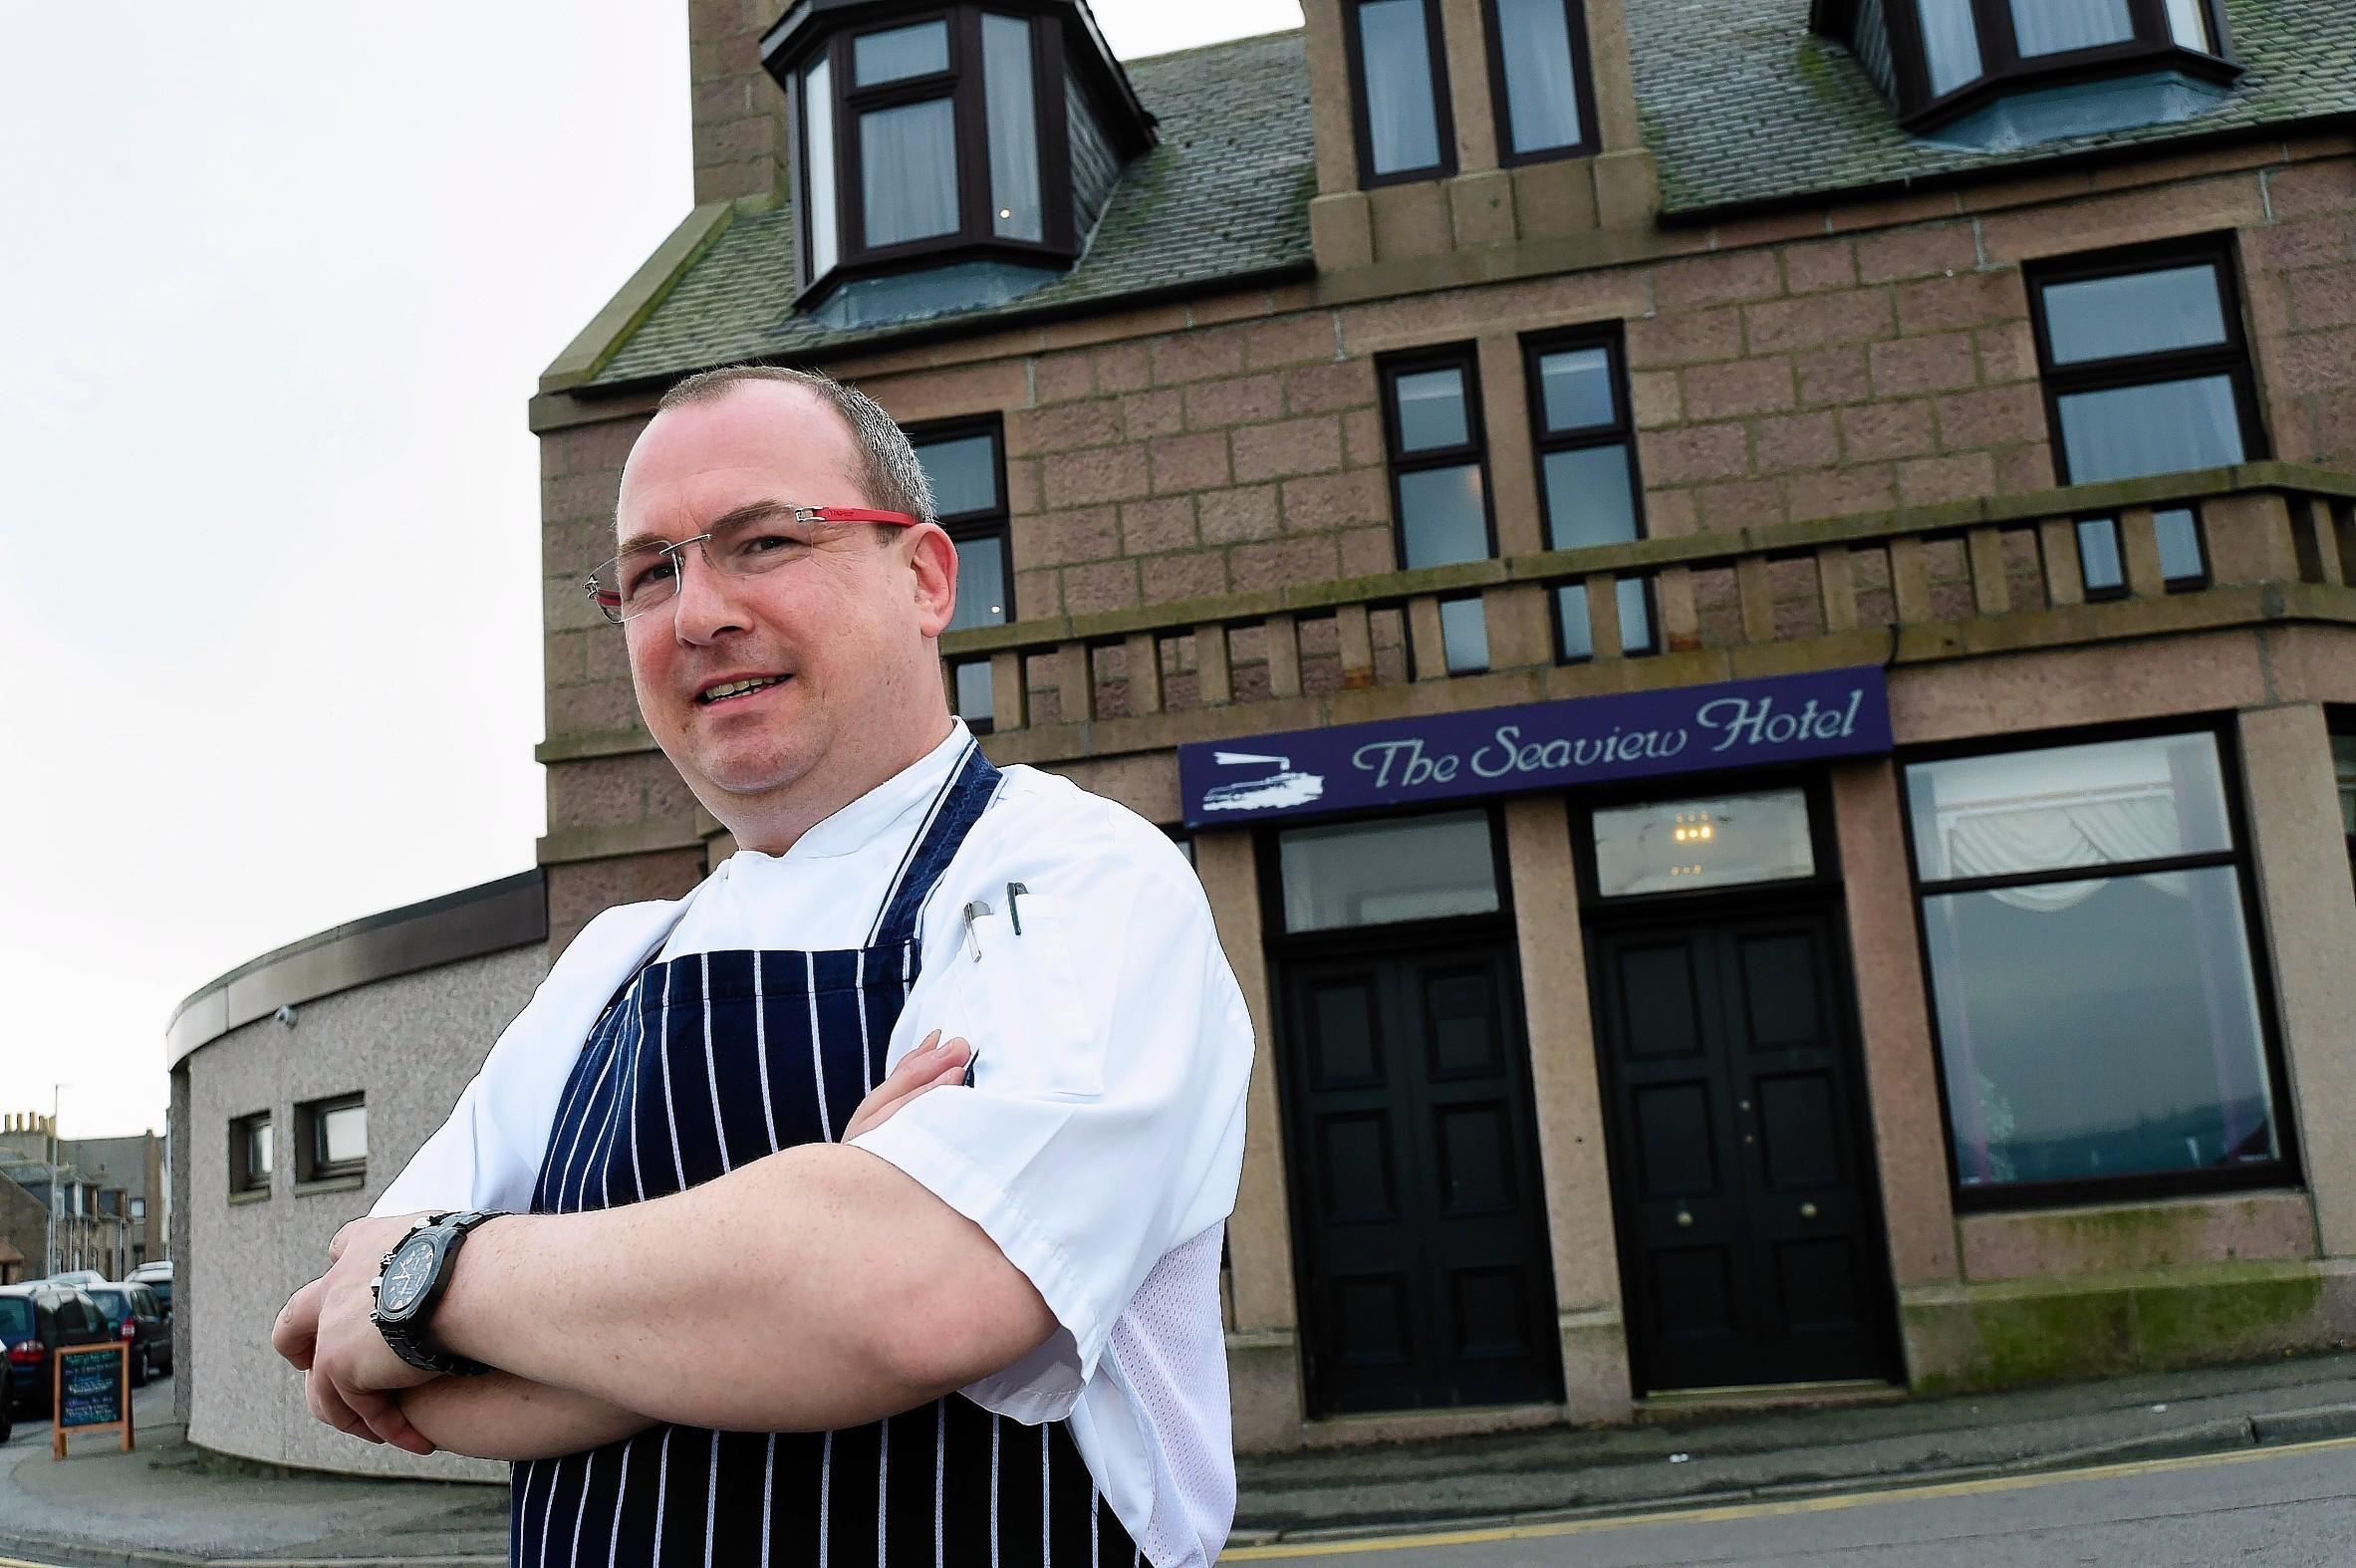 Head chef at the Seaview Hotel, Craig Molloy